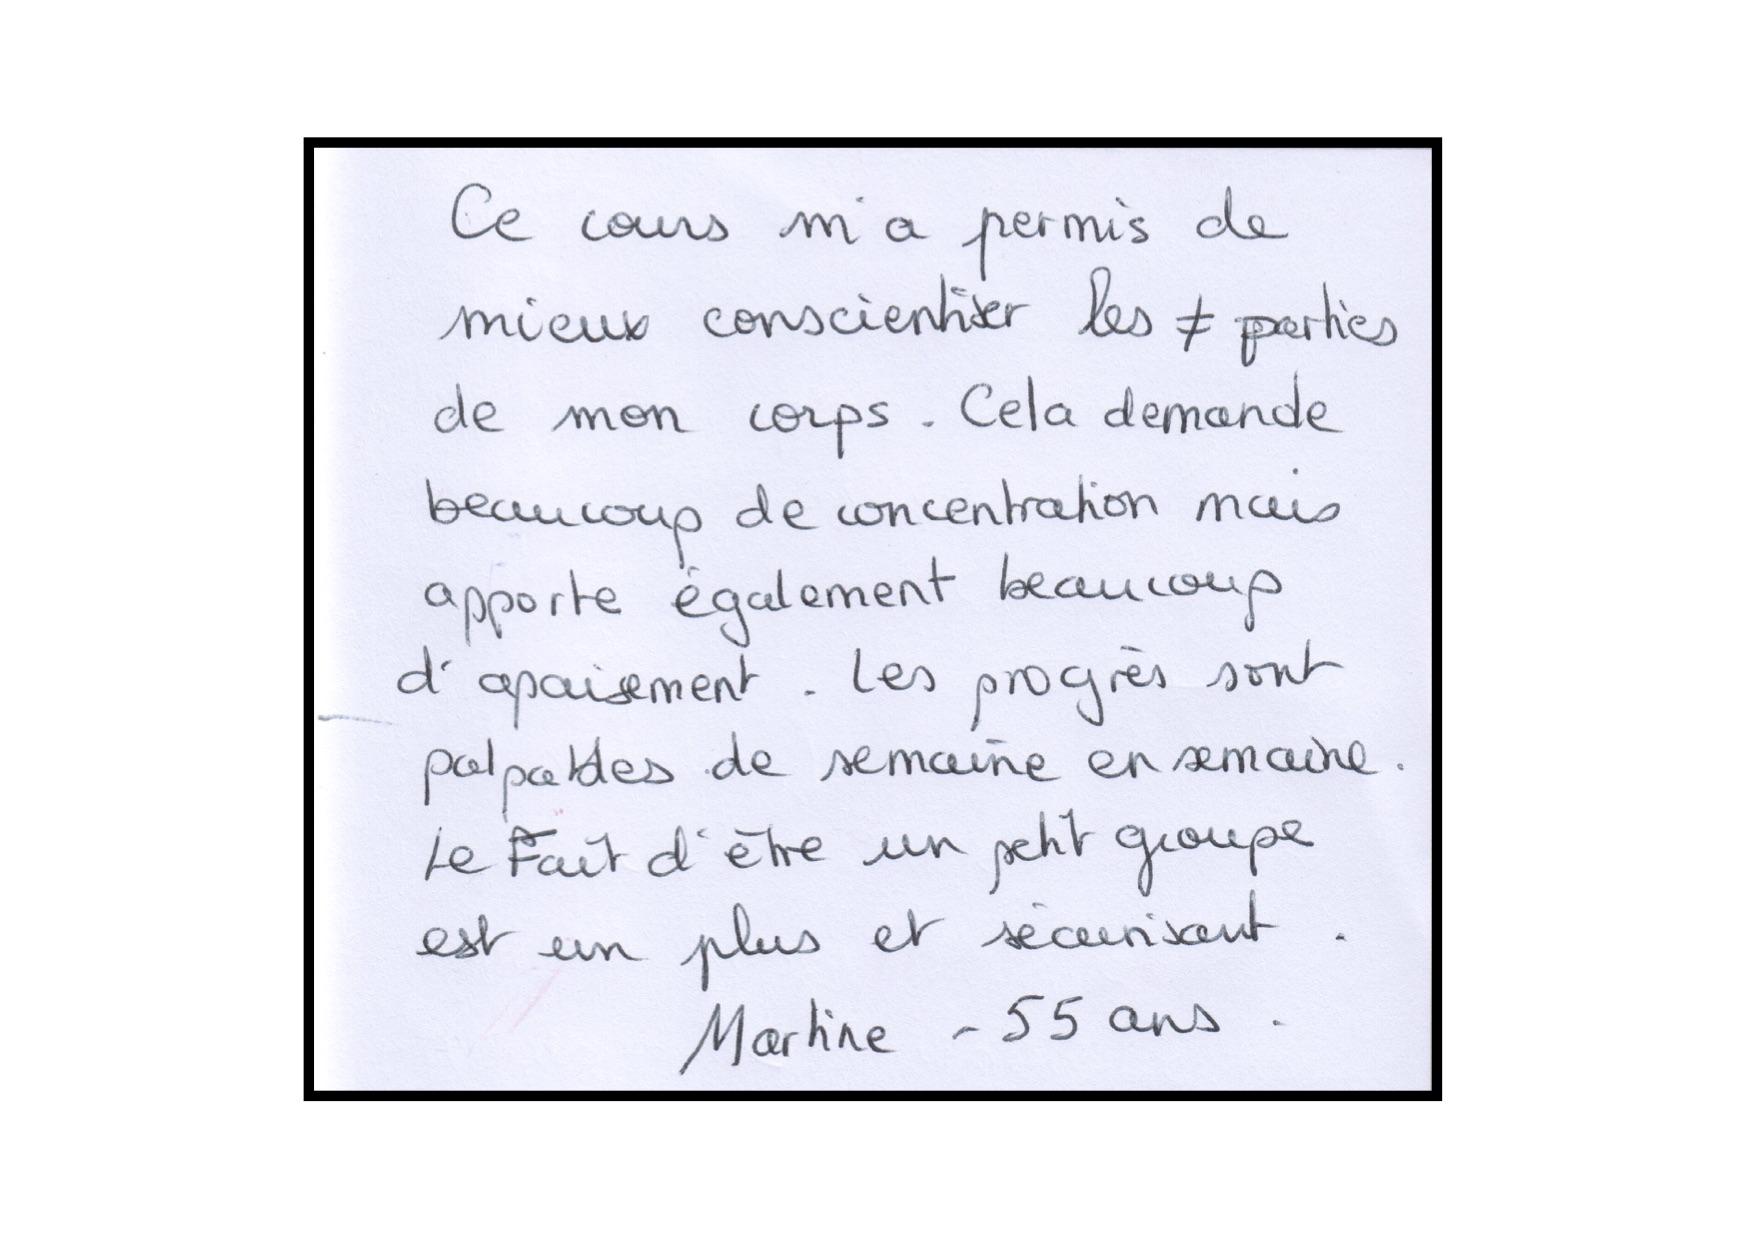 Témoignage de Martine